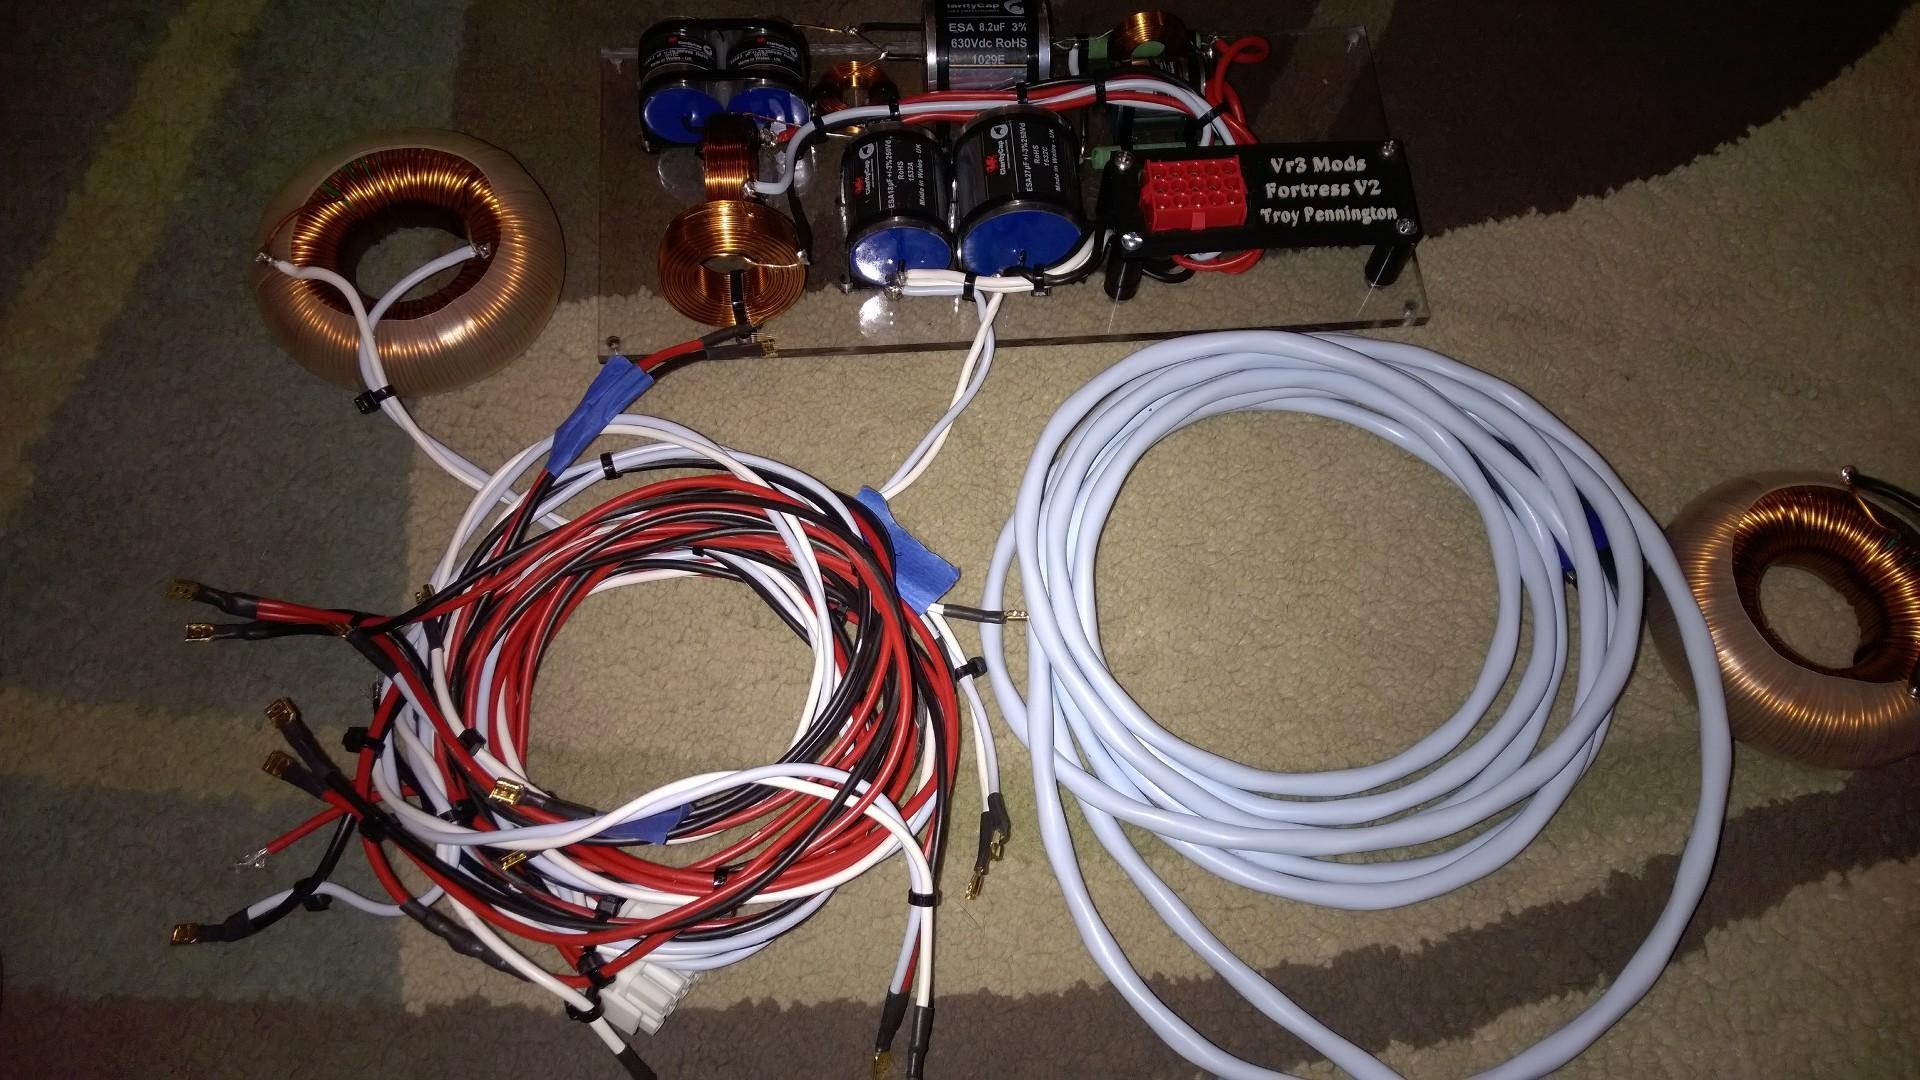 Polk Audio Sda Srs 23tl Modification Thread Vr3 Car Stereo Wire Harness Wp 20151024 20 26 Pro 5835k